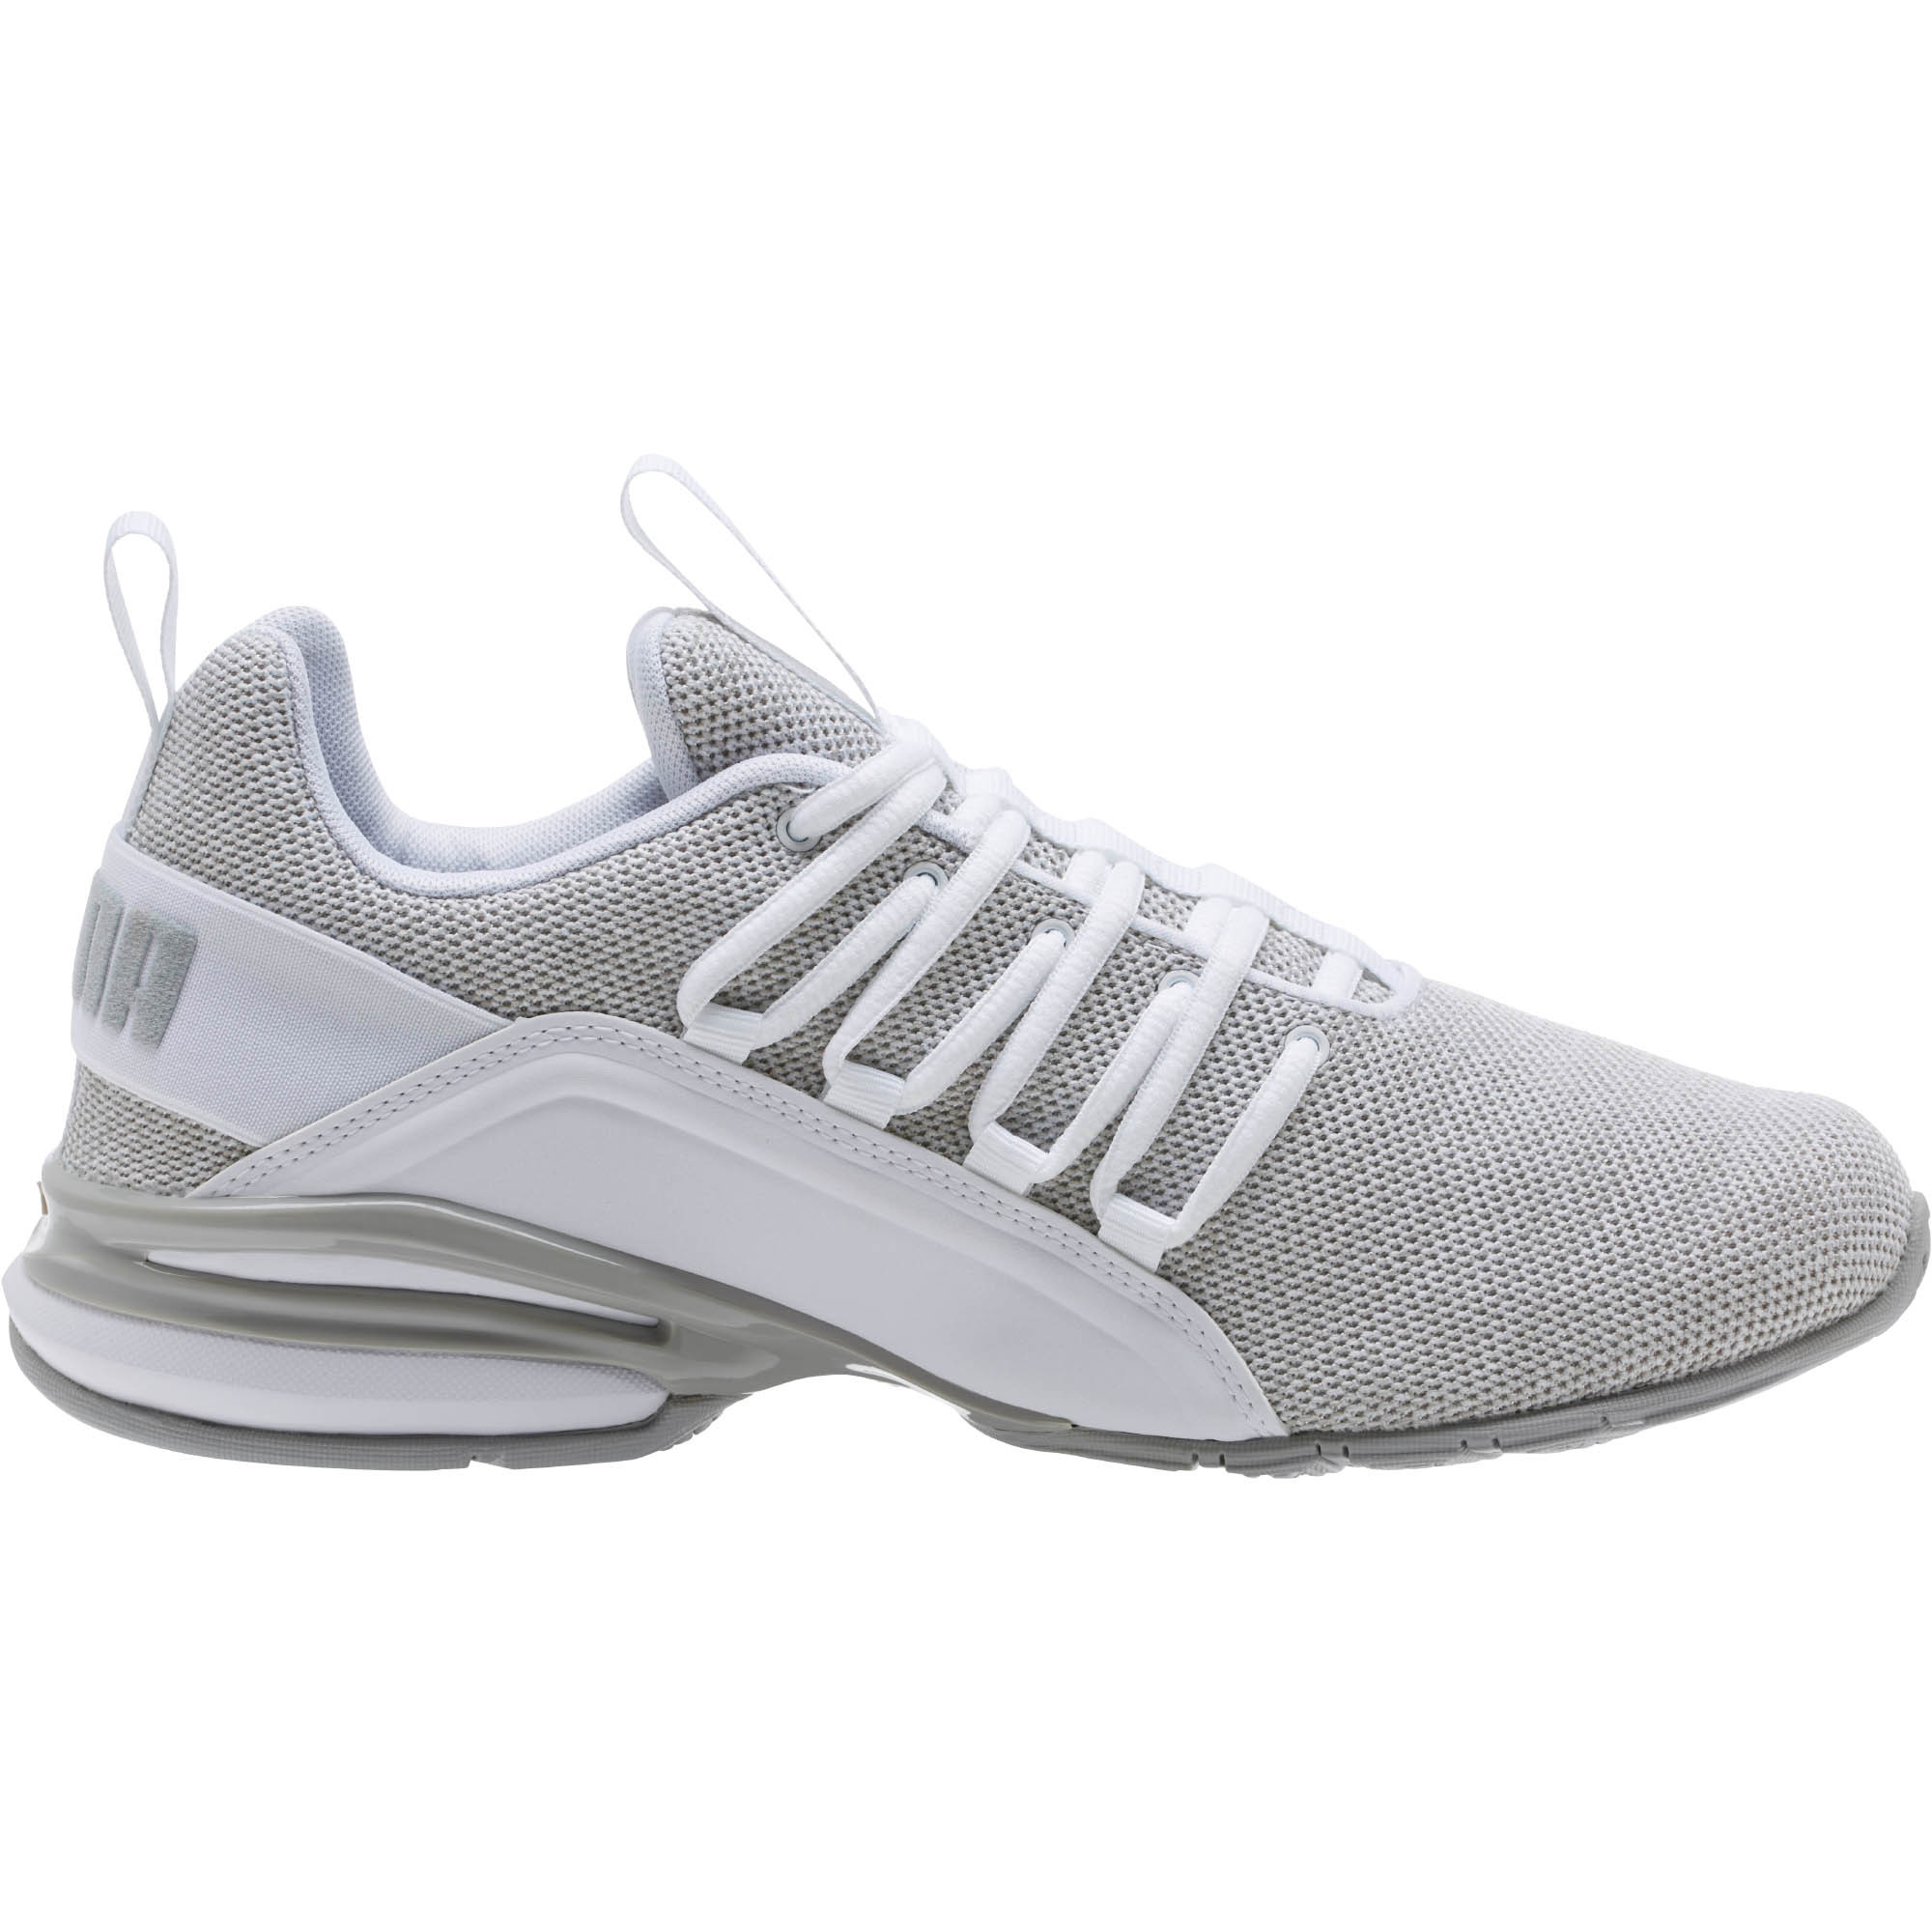 PUMA-Axelion-Men-039-s-Training-Shoes-Men-Shoe-Running thumbnail 15